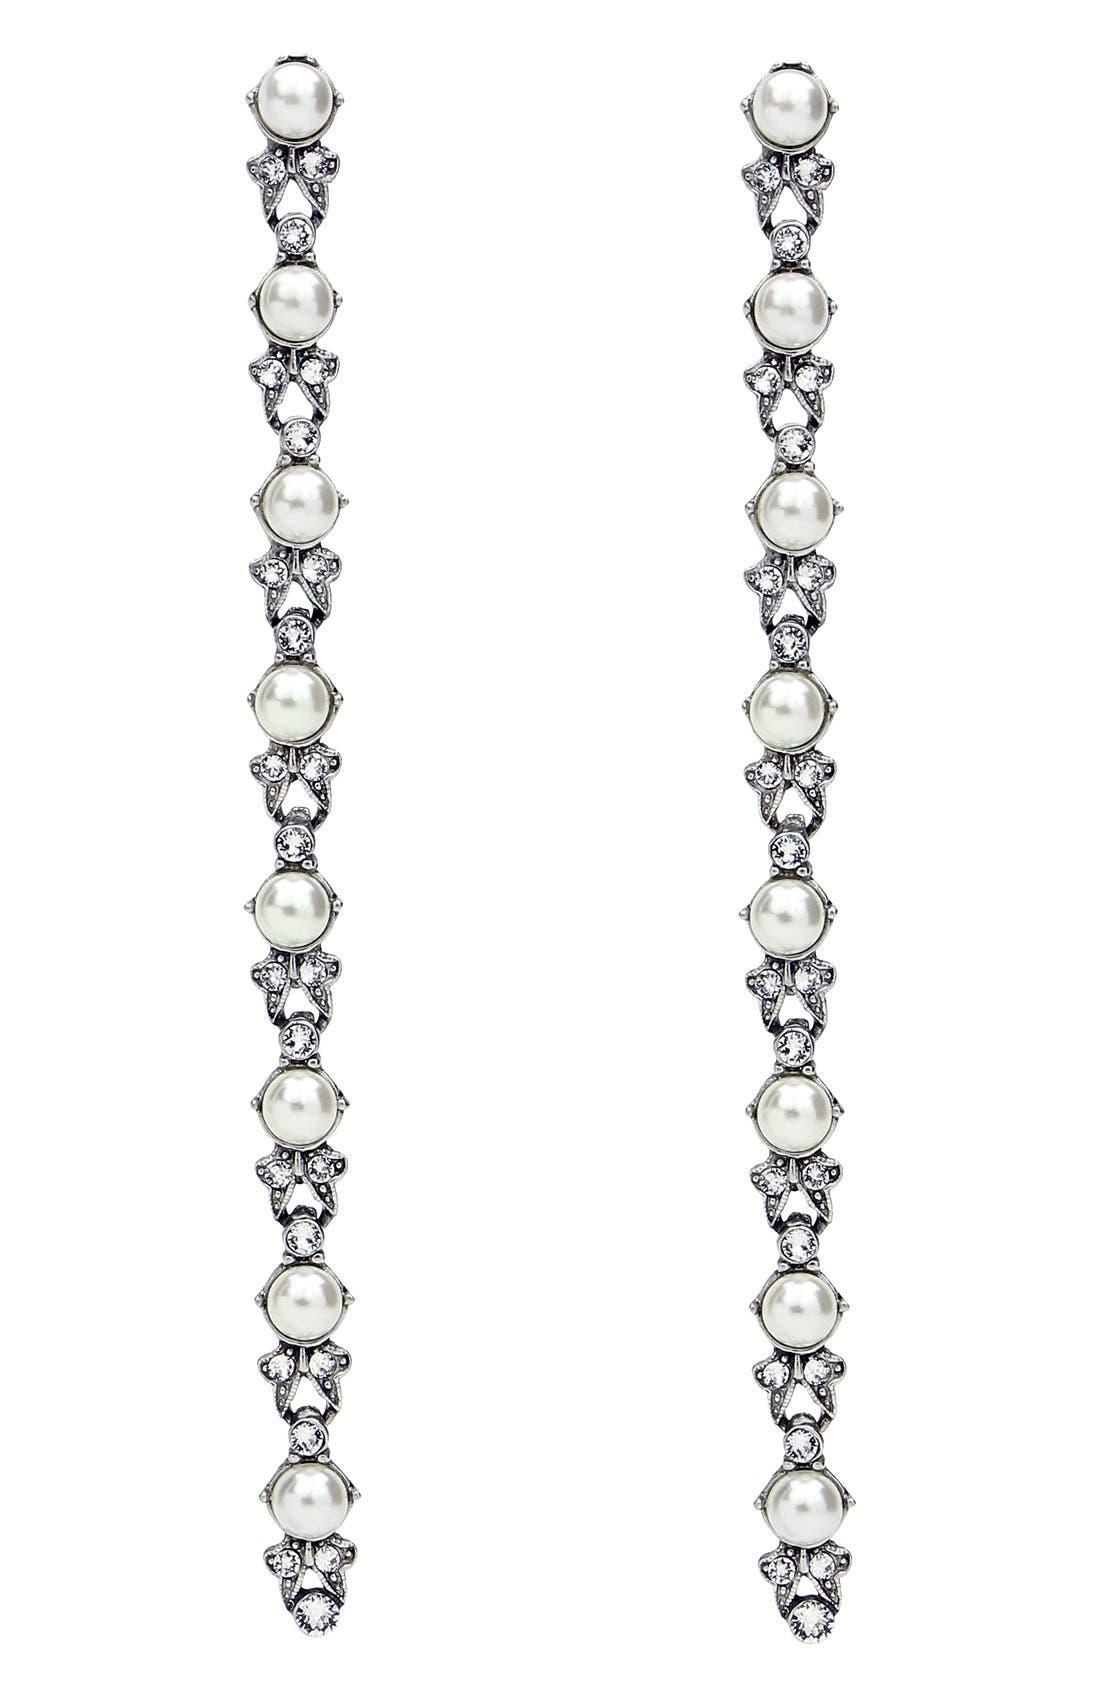 Main Image - BEN-AMUN Faux Pearl & Crystal Linear Drop Earrings